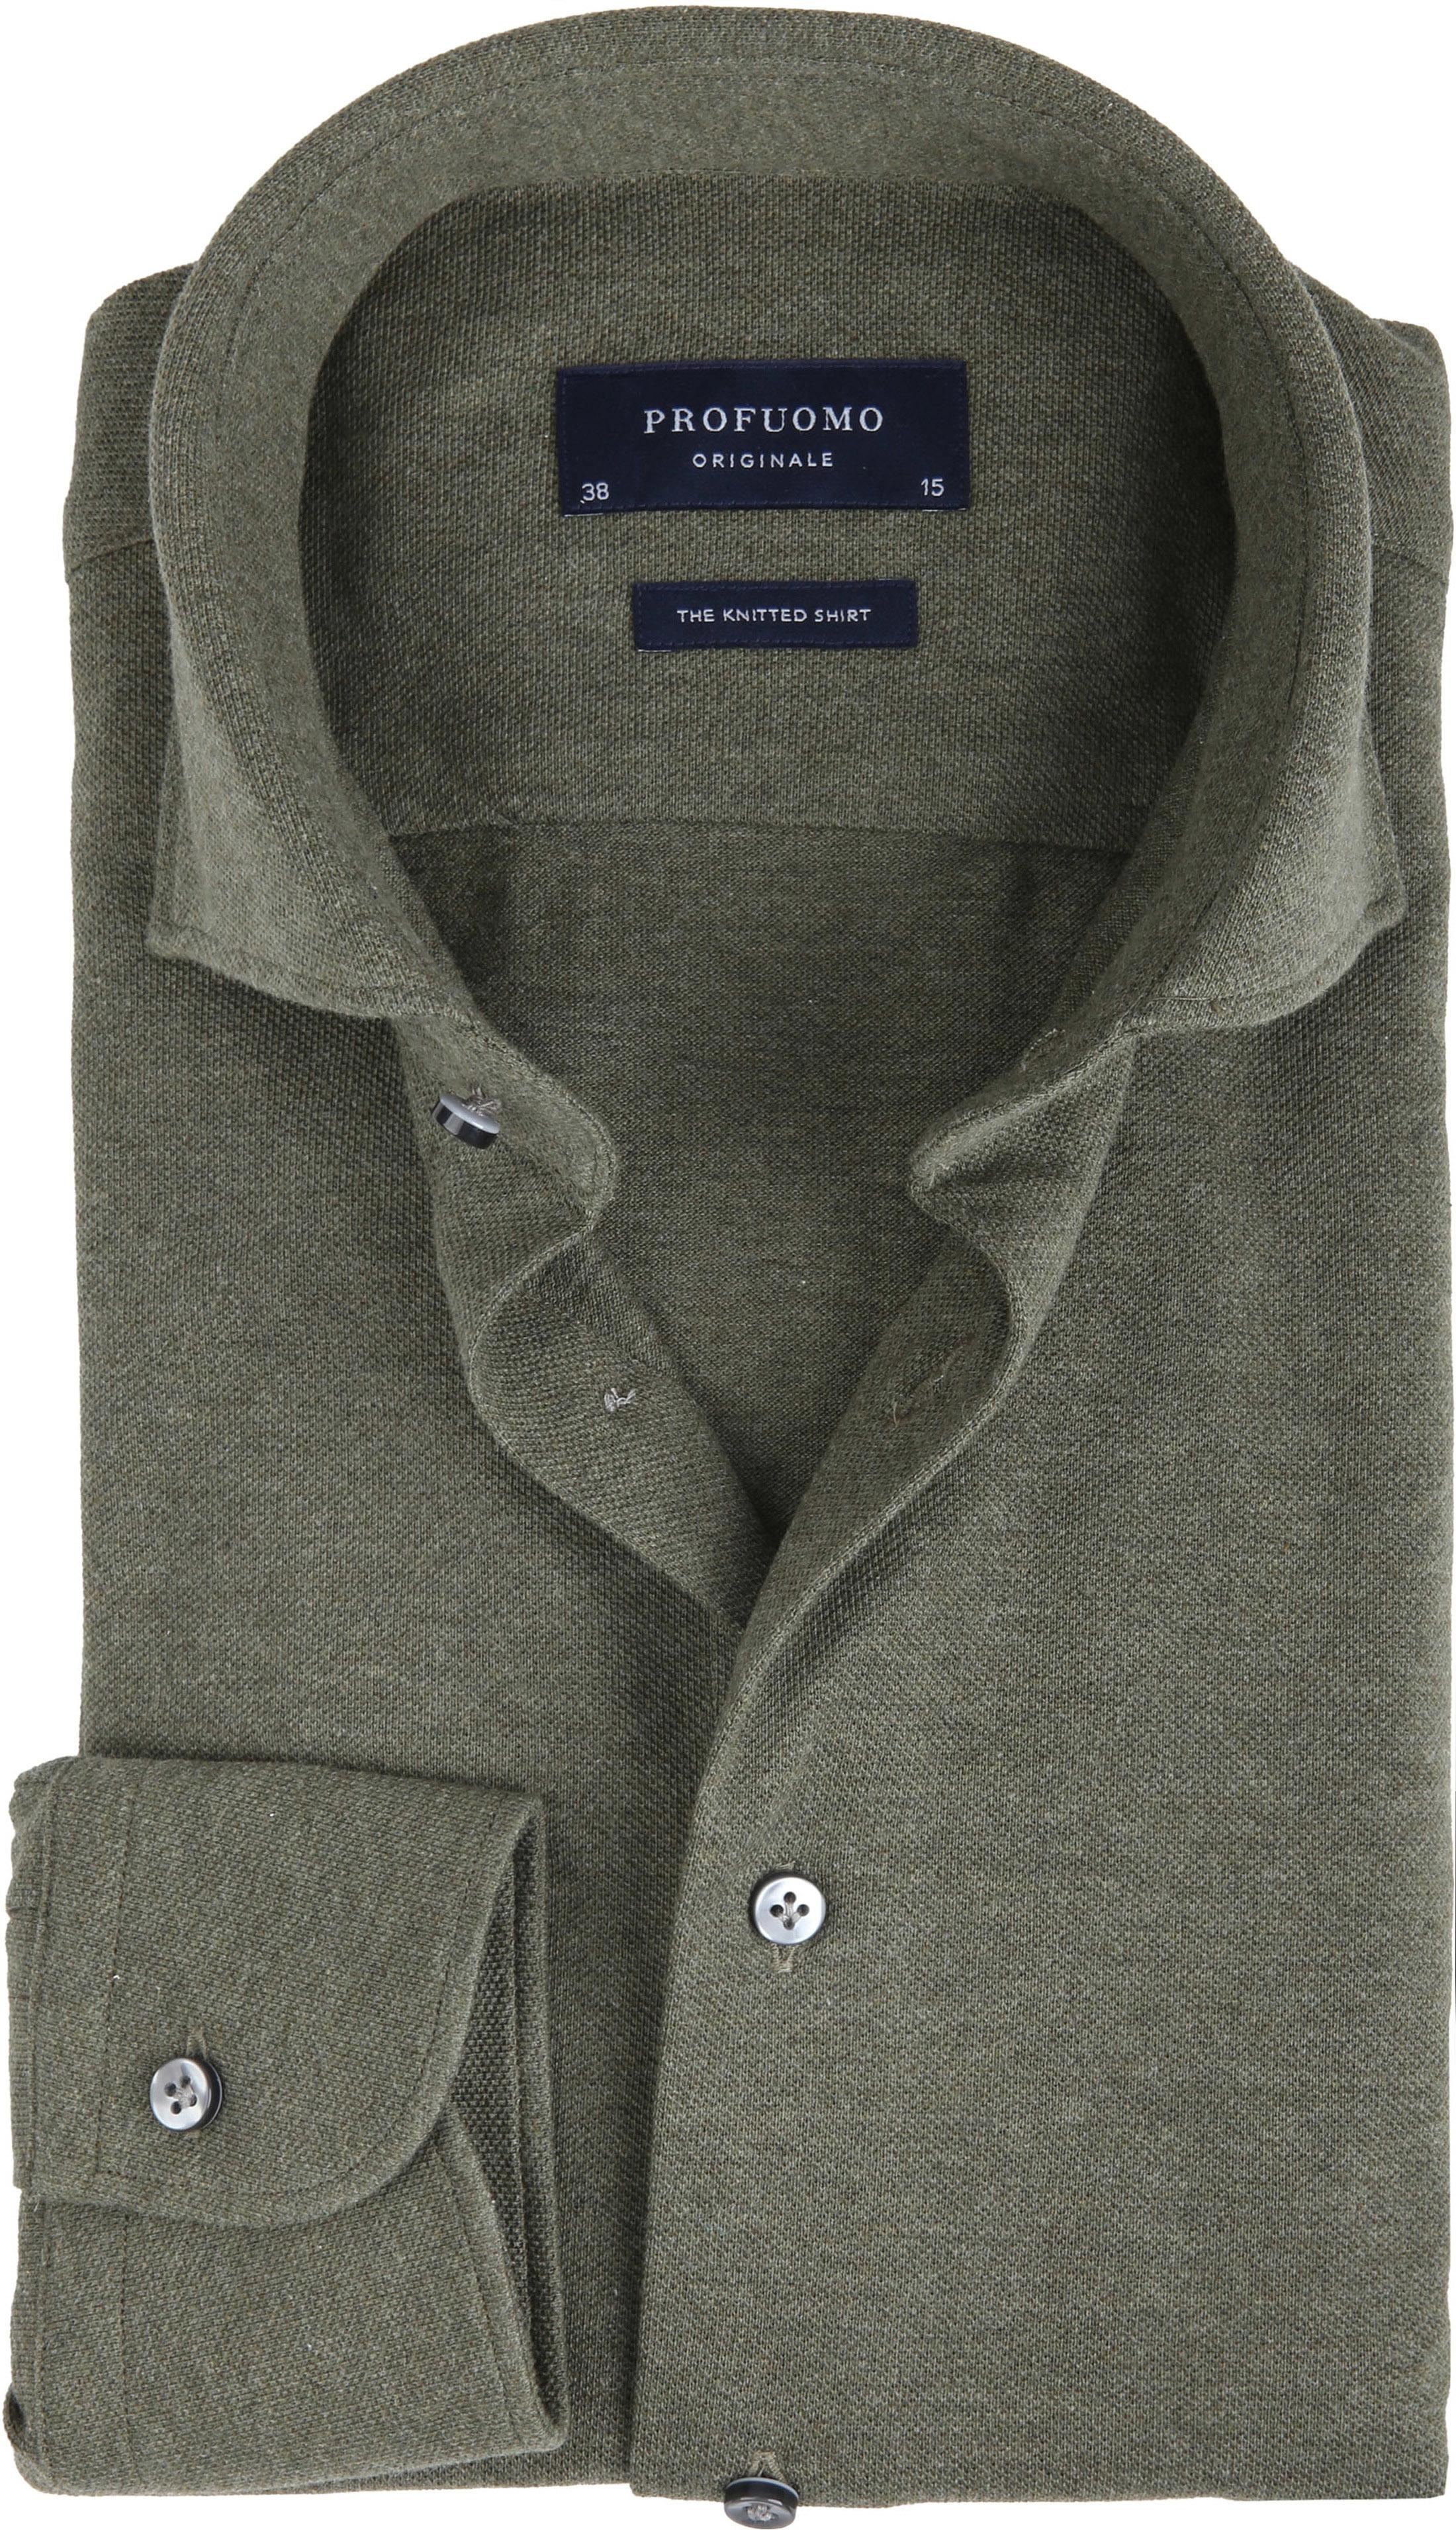 Profuomo Hemd Knitted Slim Fit Grün